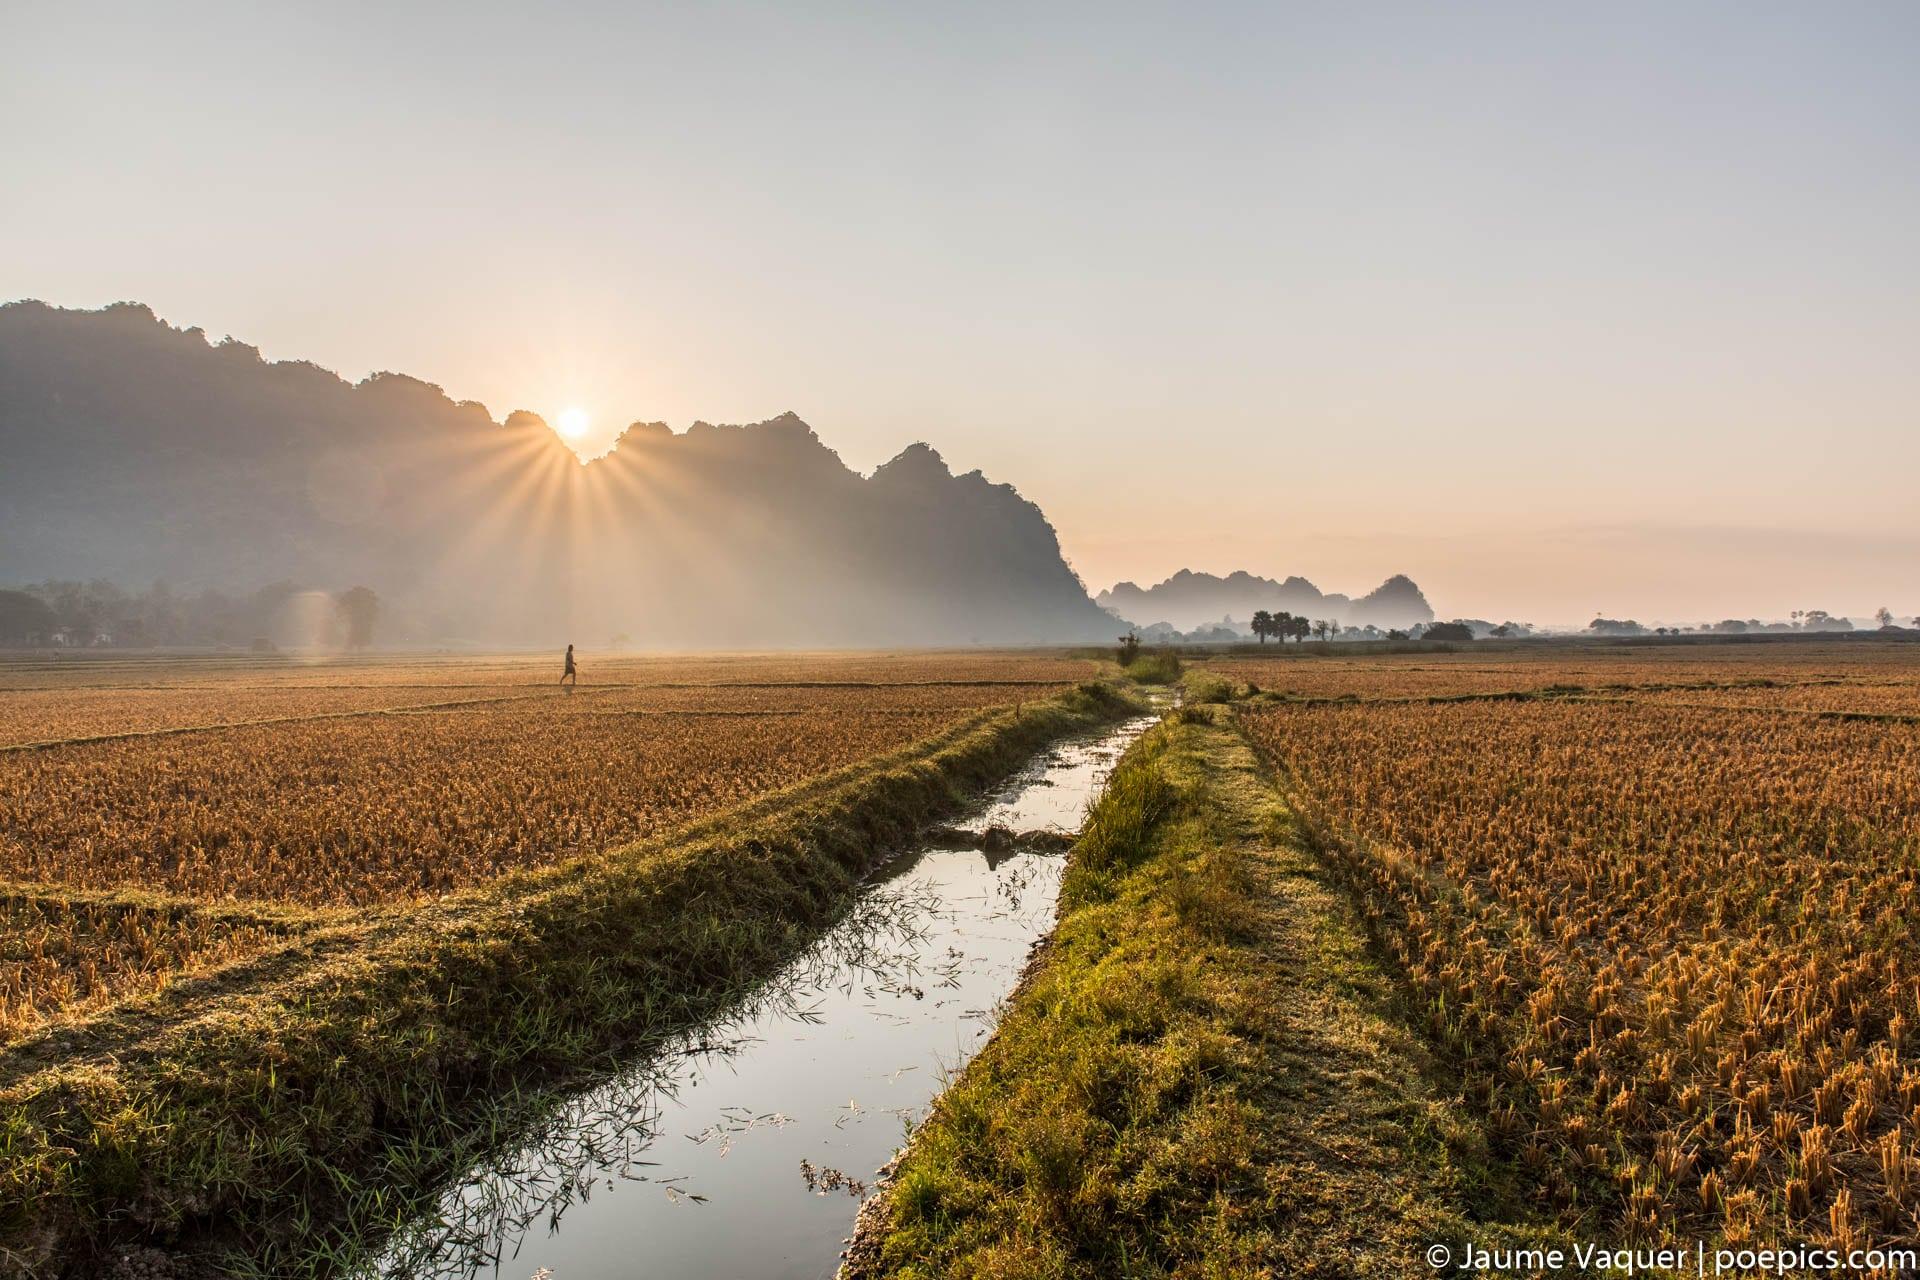 Sunrise in a rice field of Hpa-An, Myanmar (Burma)